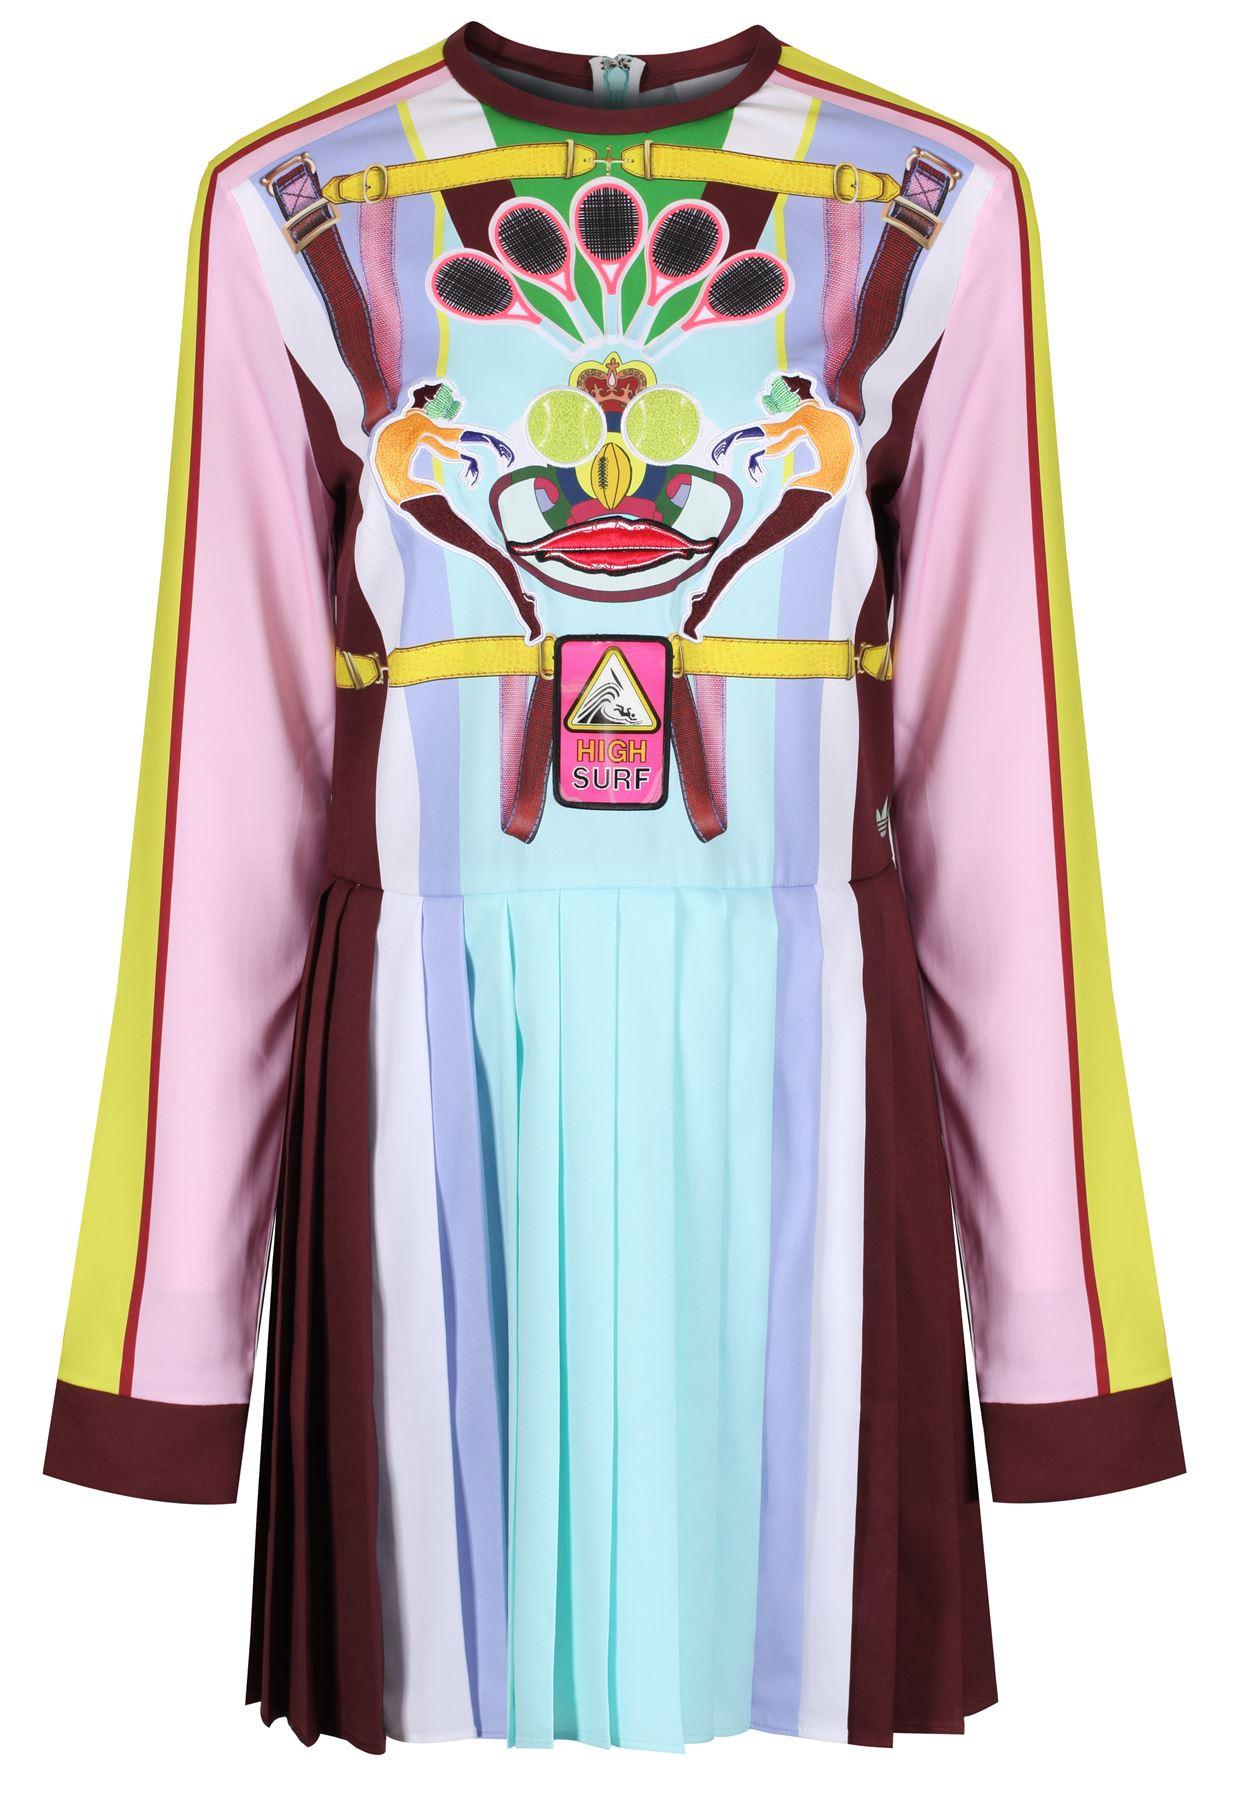 adidas ORIGINALS X MARY KATRANTZOU PLEATED DRESS BLUE WOMEN S 6 10 14 18 c356a319fa